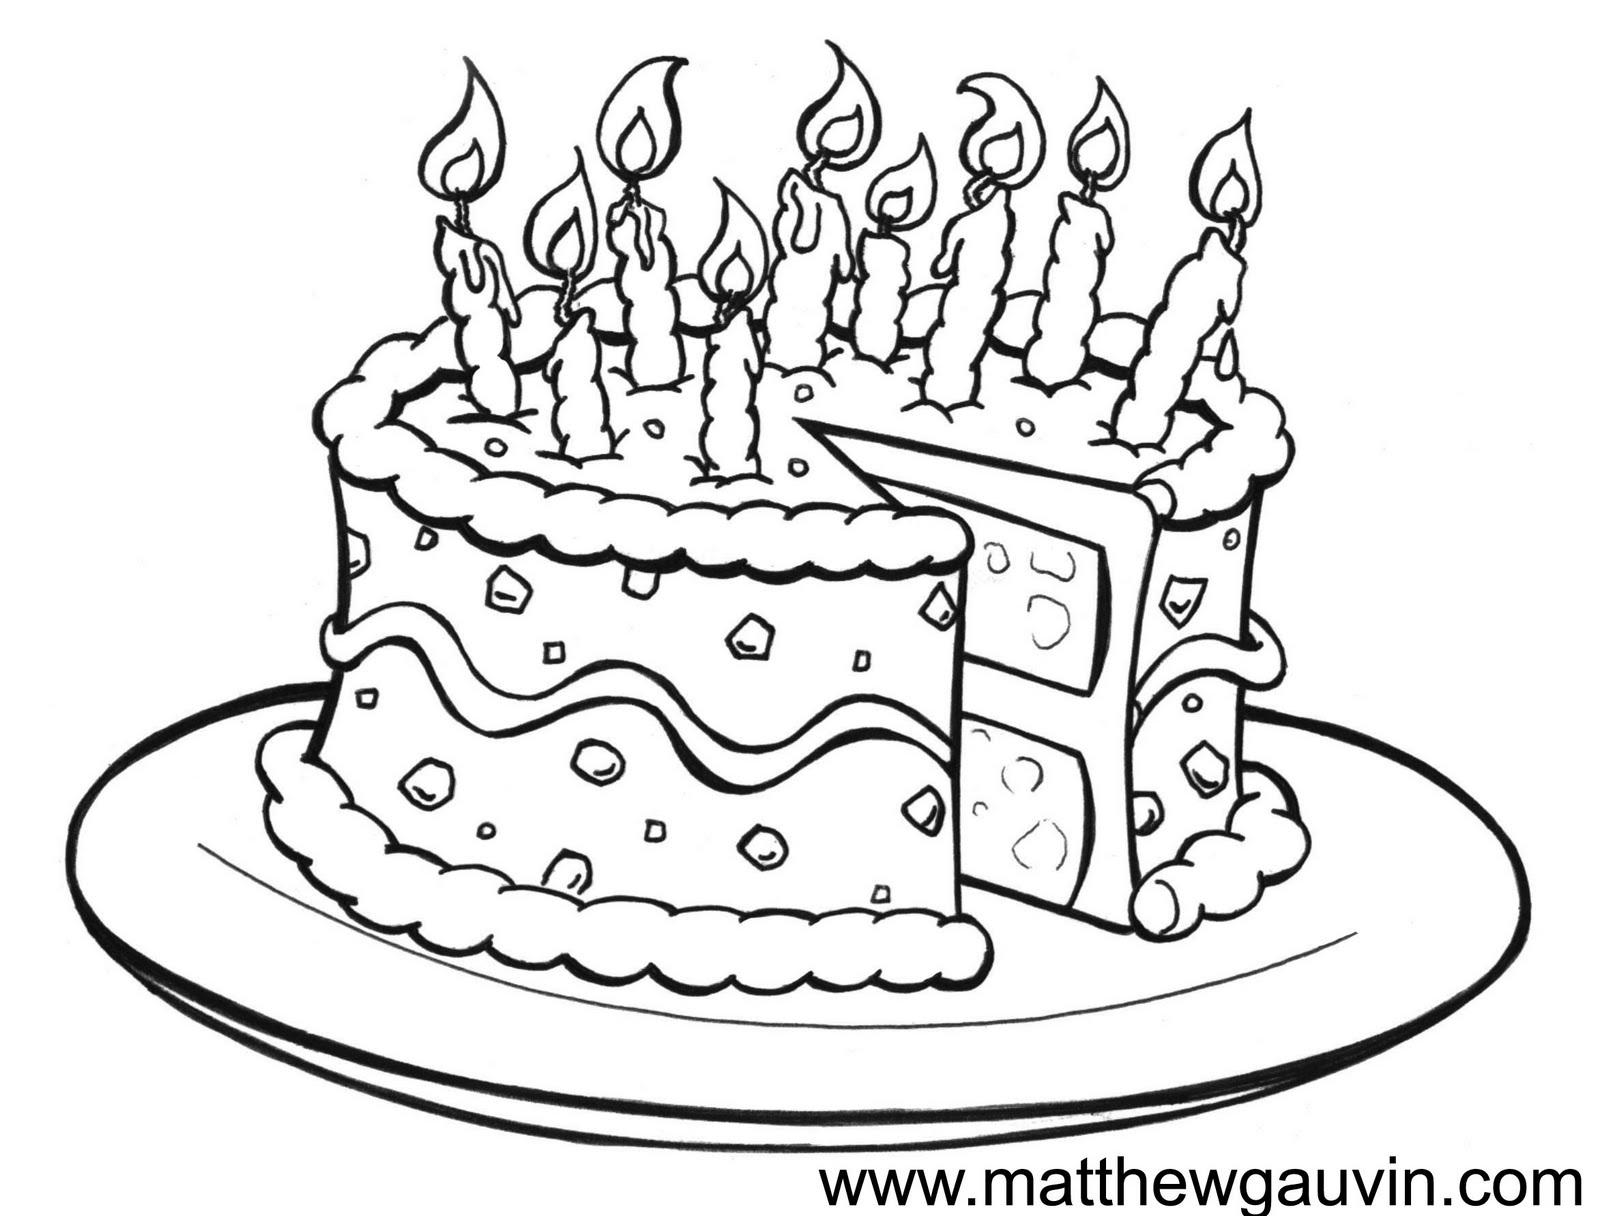 Sketch birthday cakes